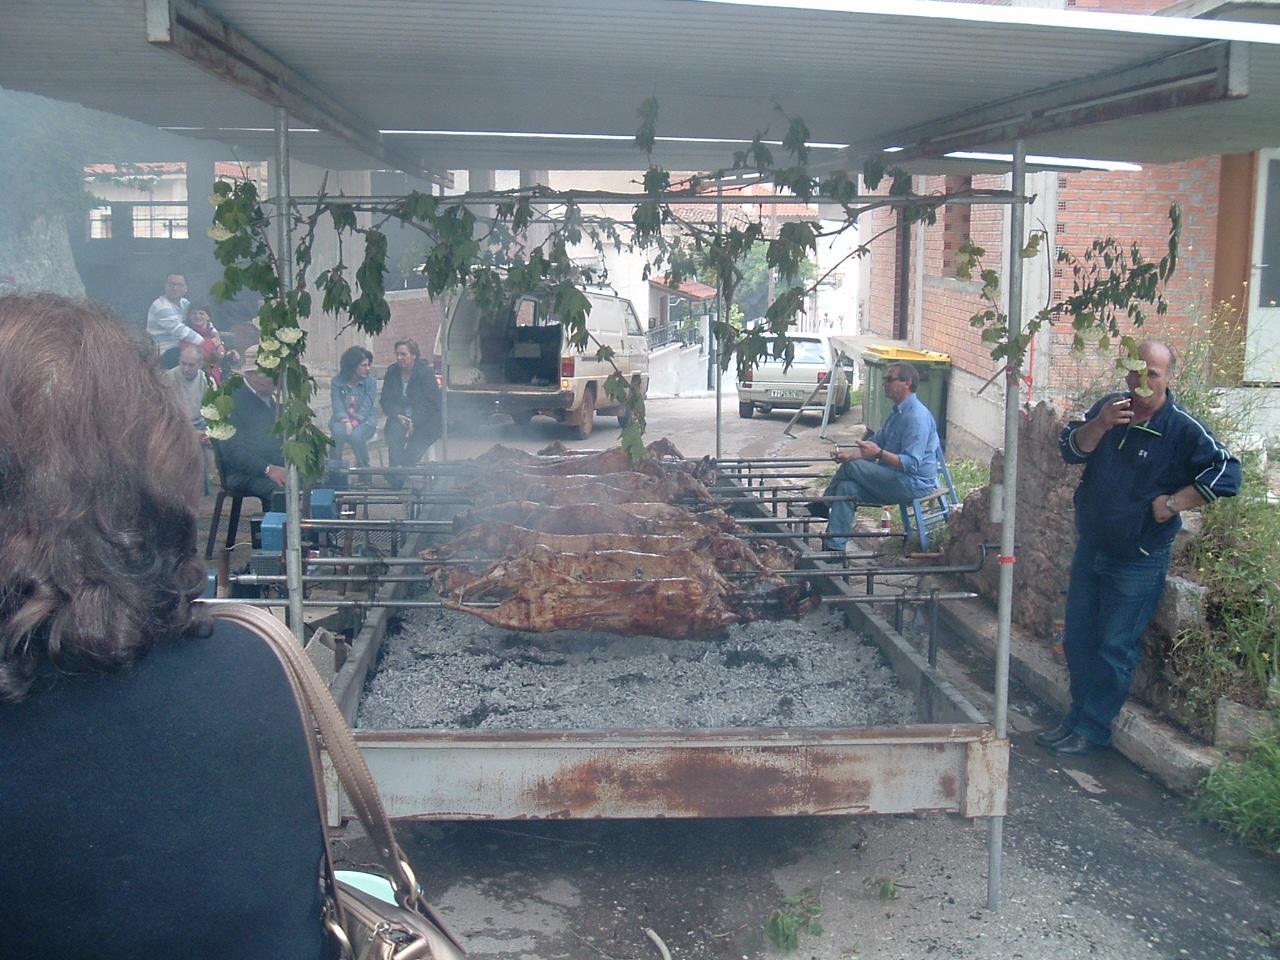 Easter celebrations in Greece